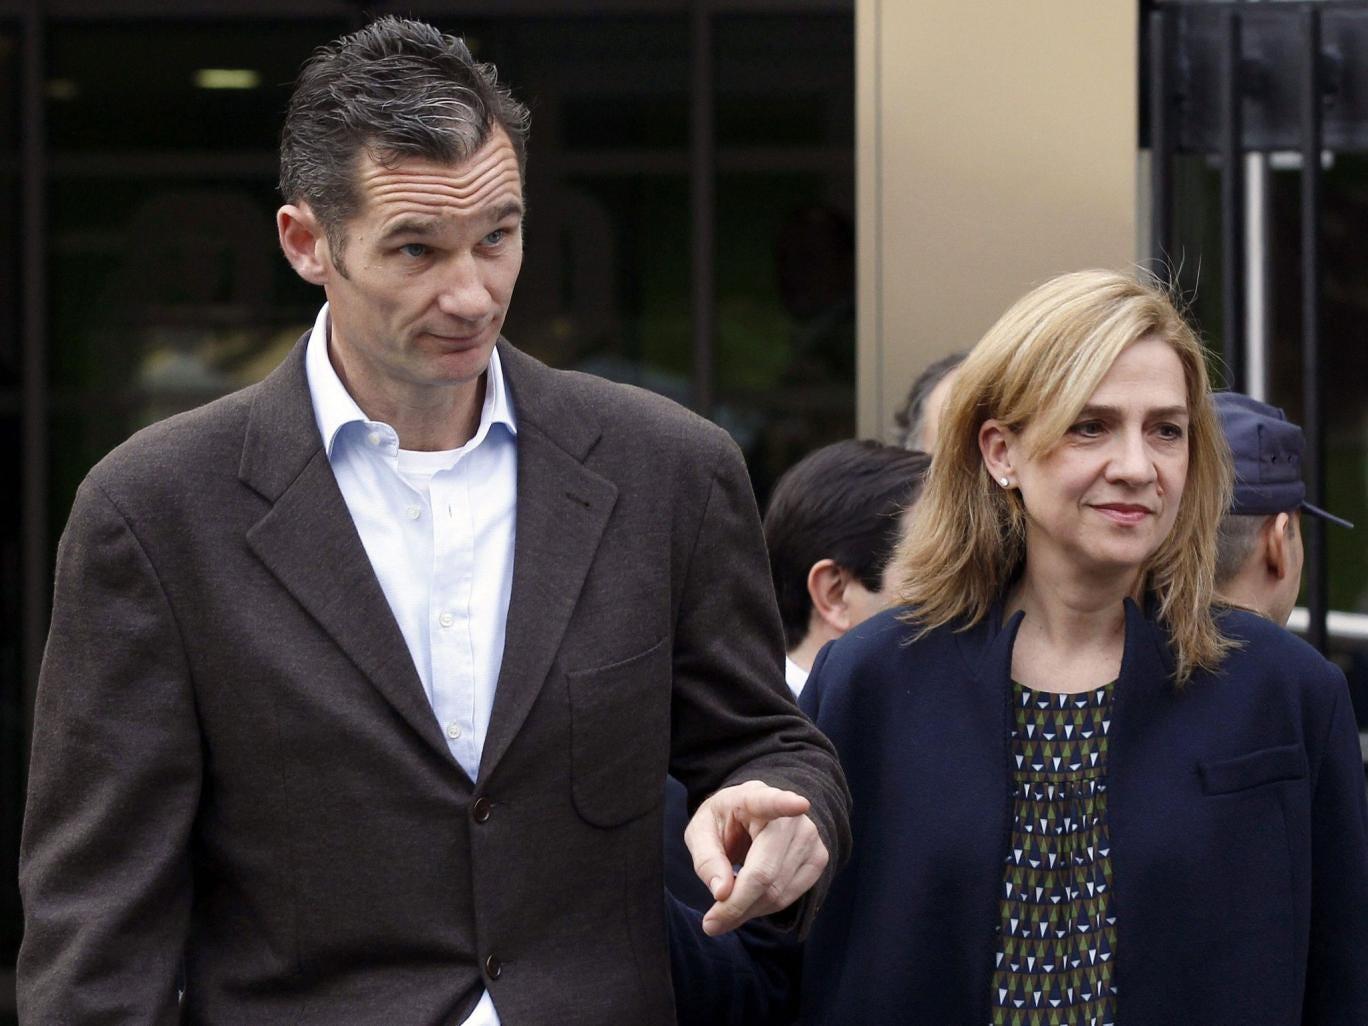 Spain's Princess Cristina, with husband Inaki Urdangarin